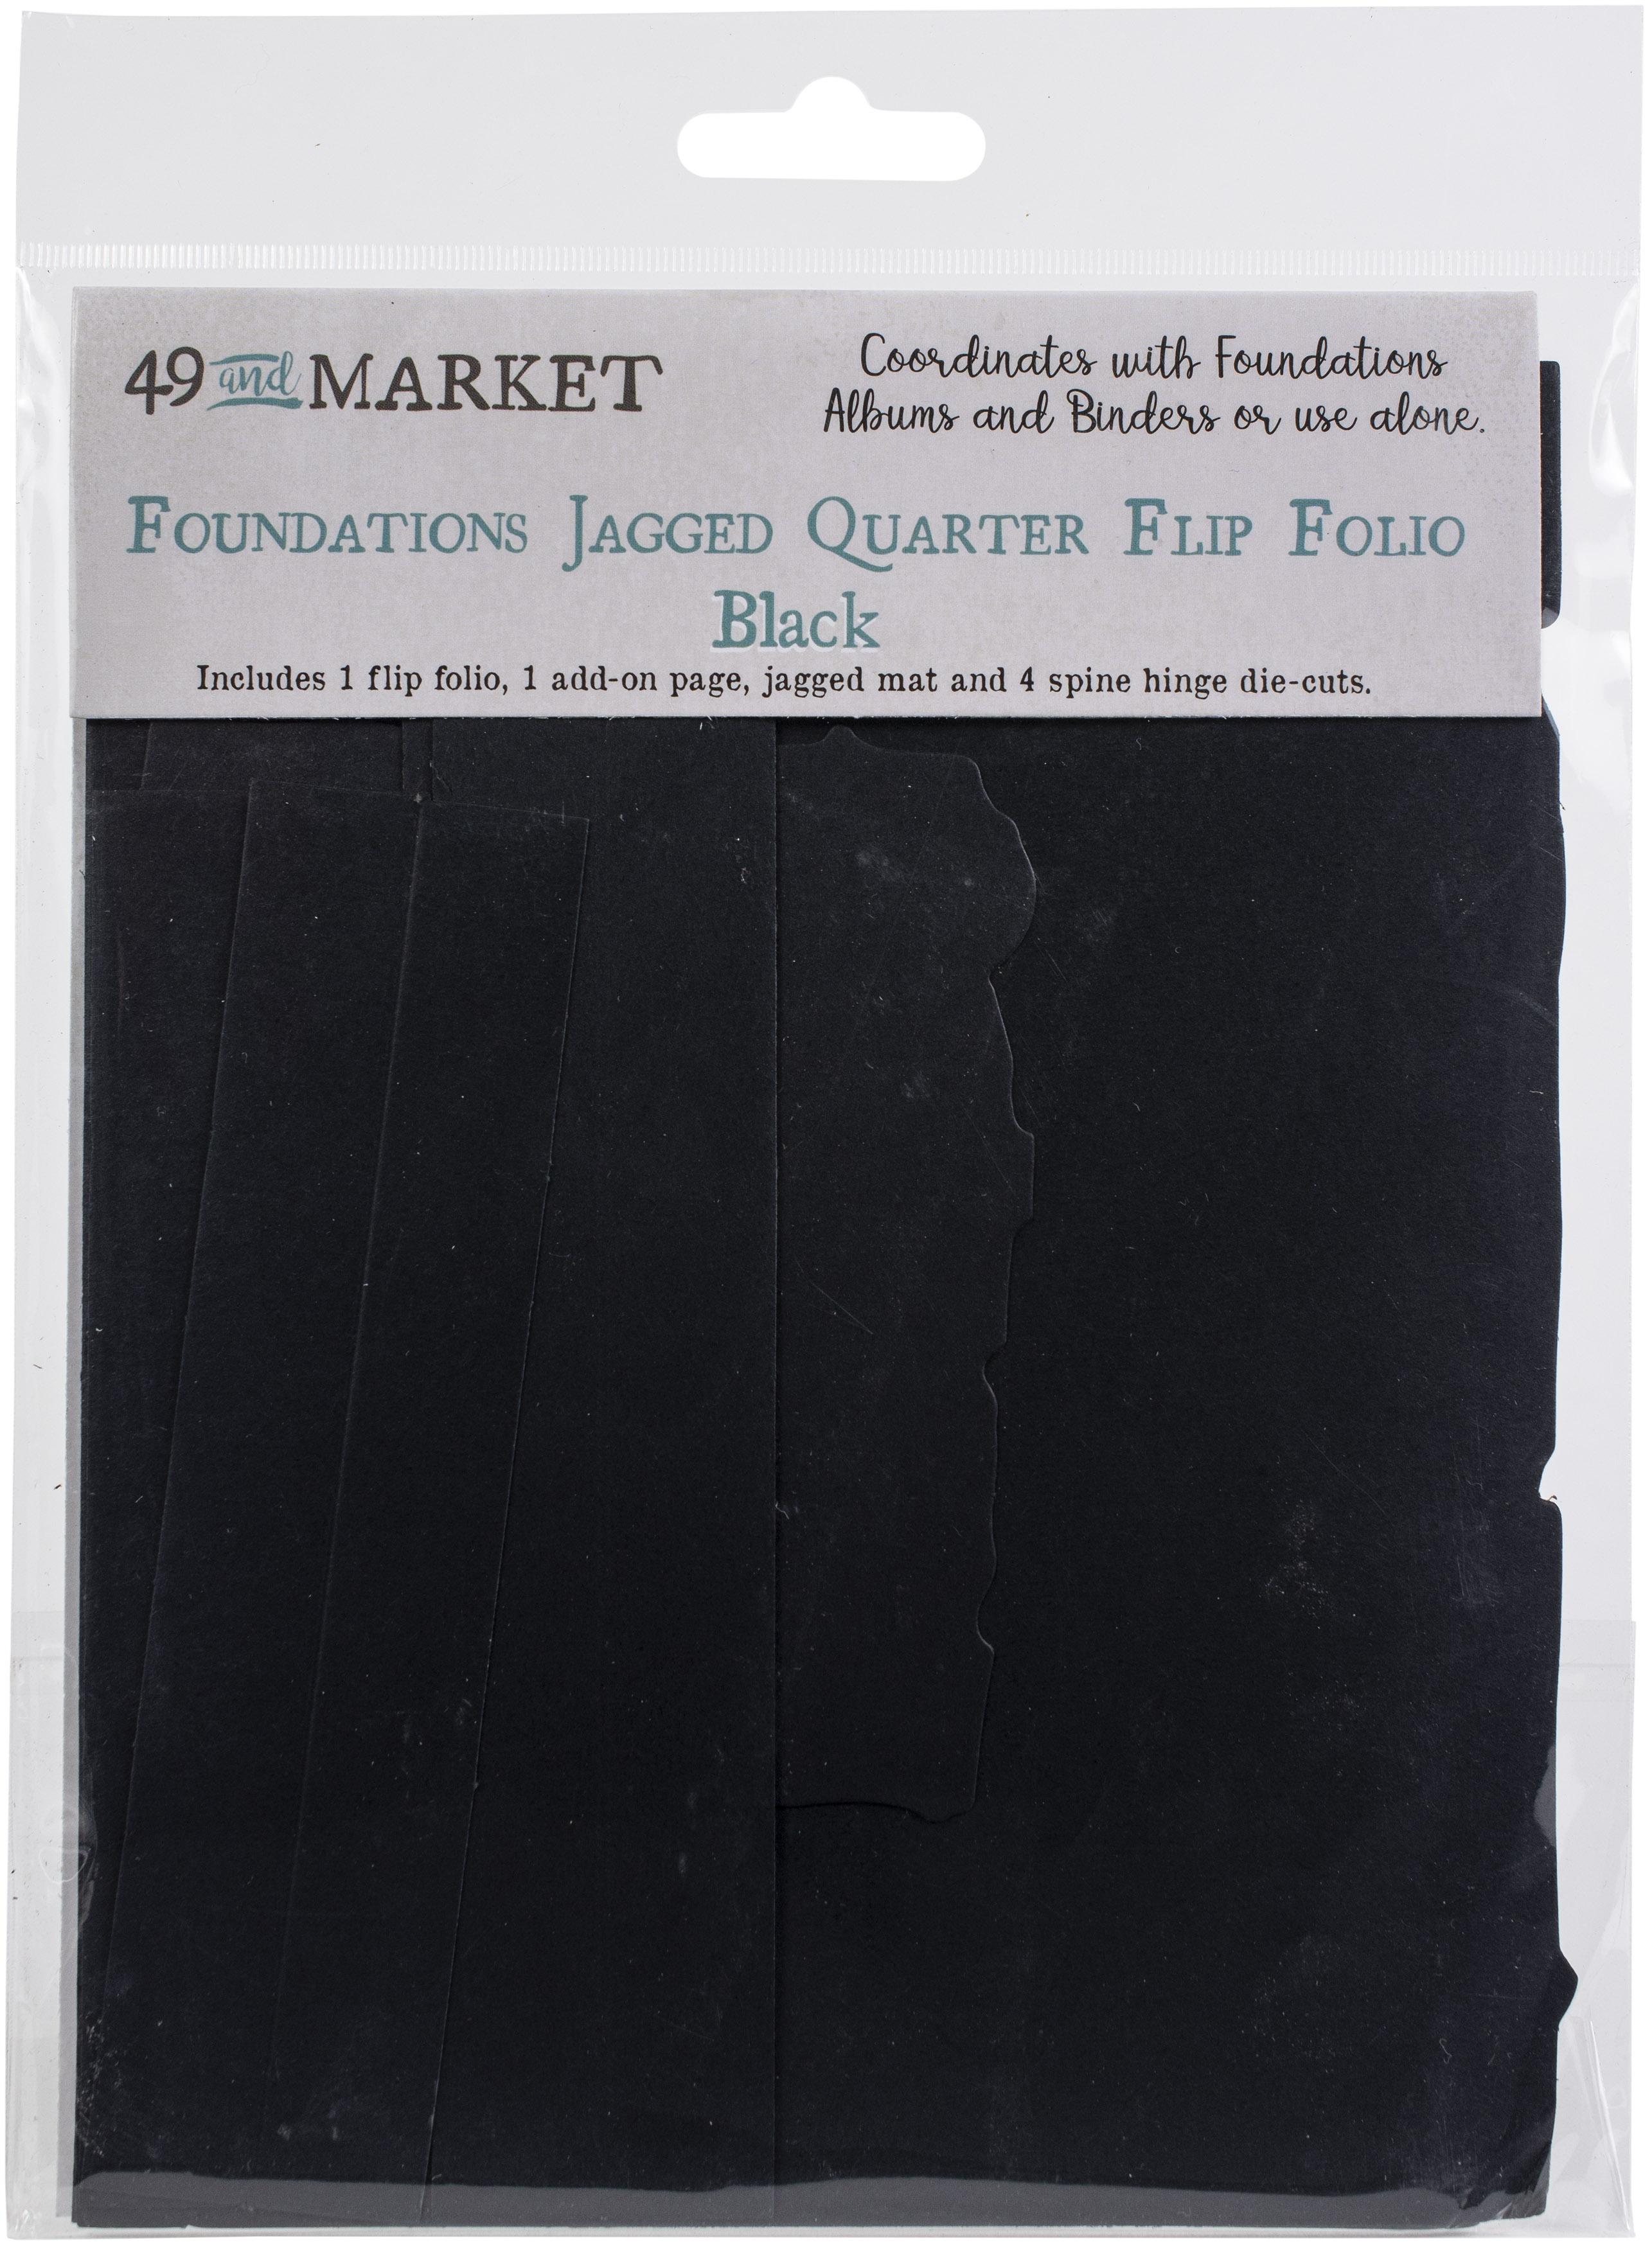 49 And Market Foundations Jagged Quarter Flip Folio-Black